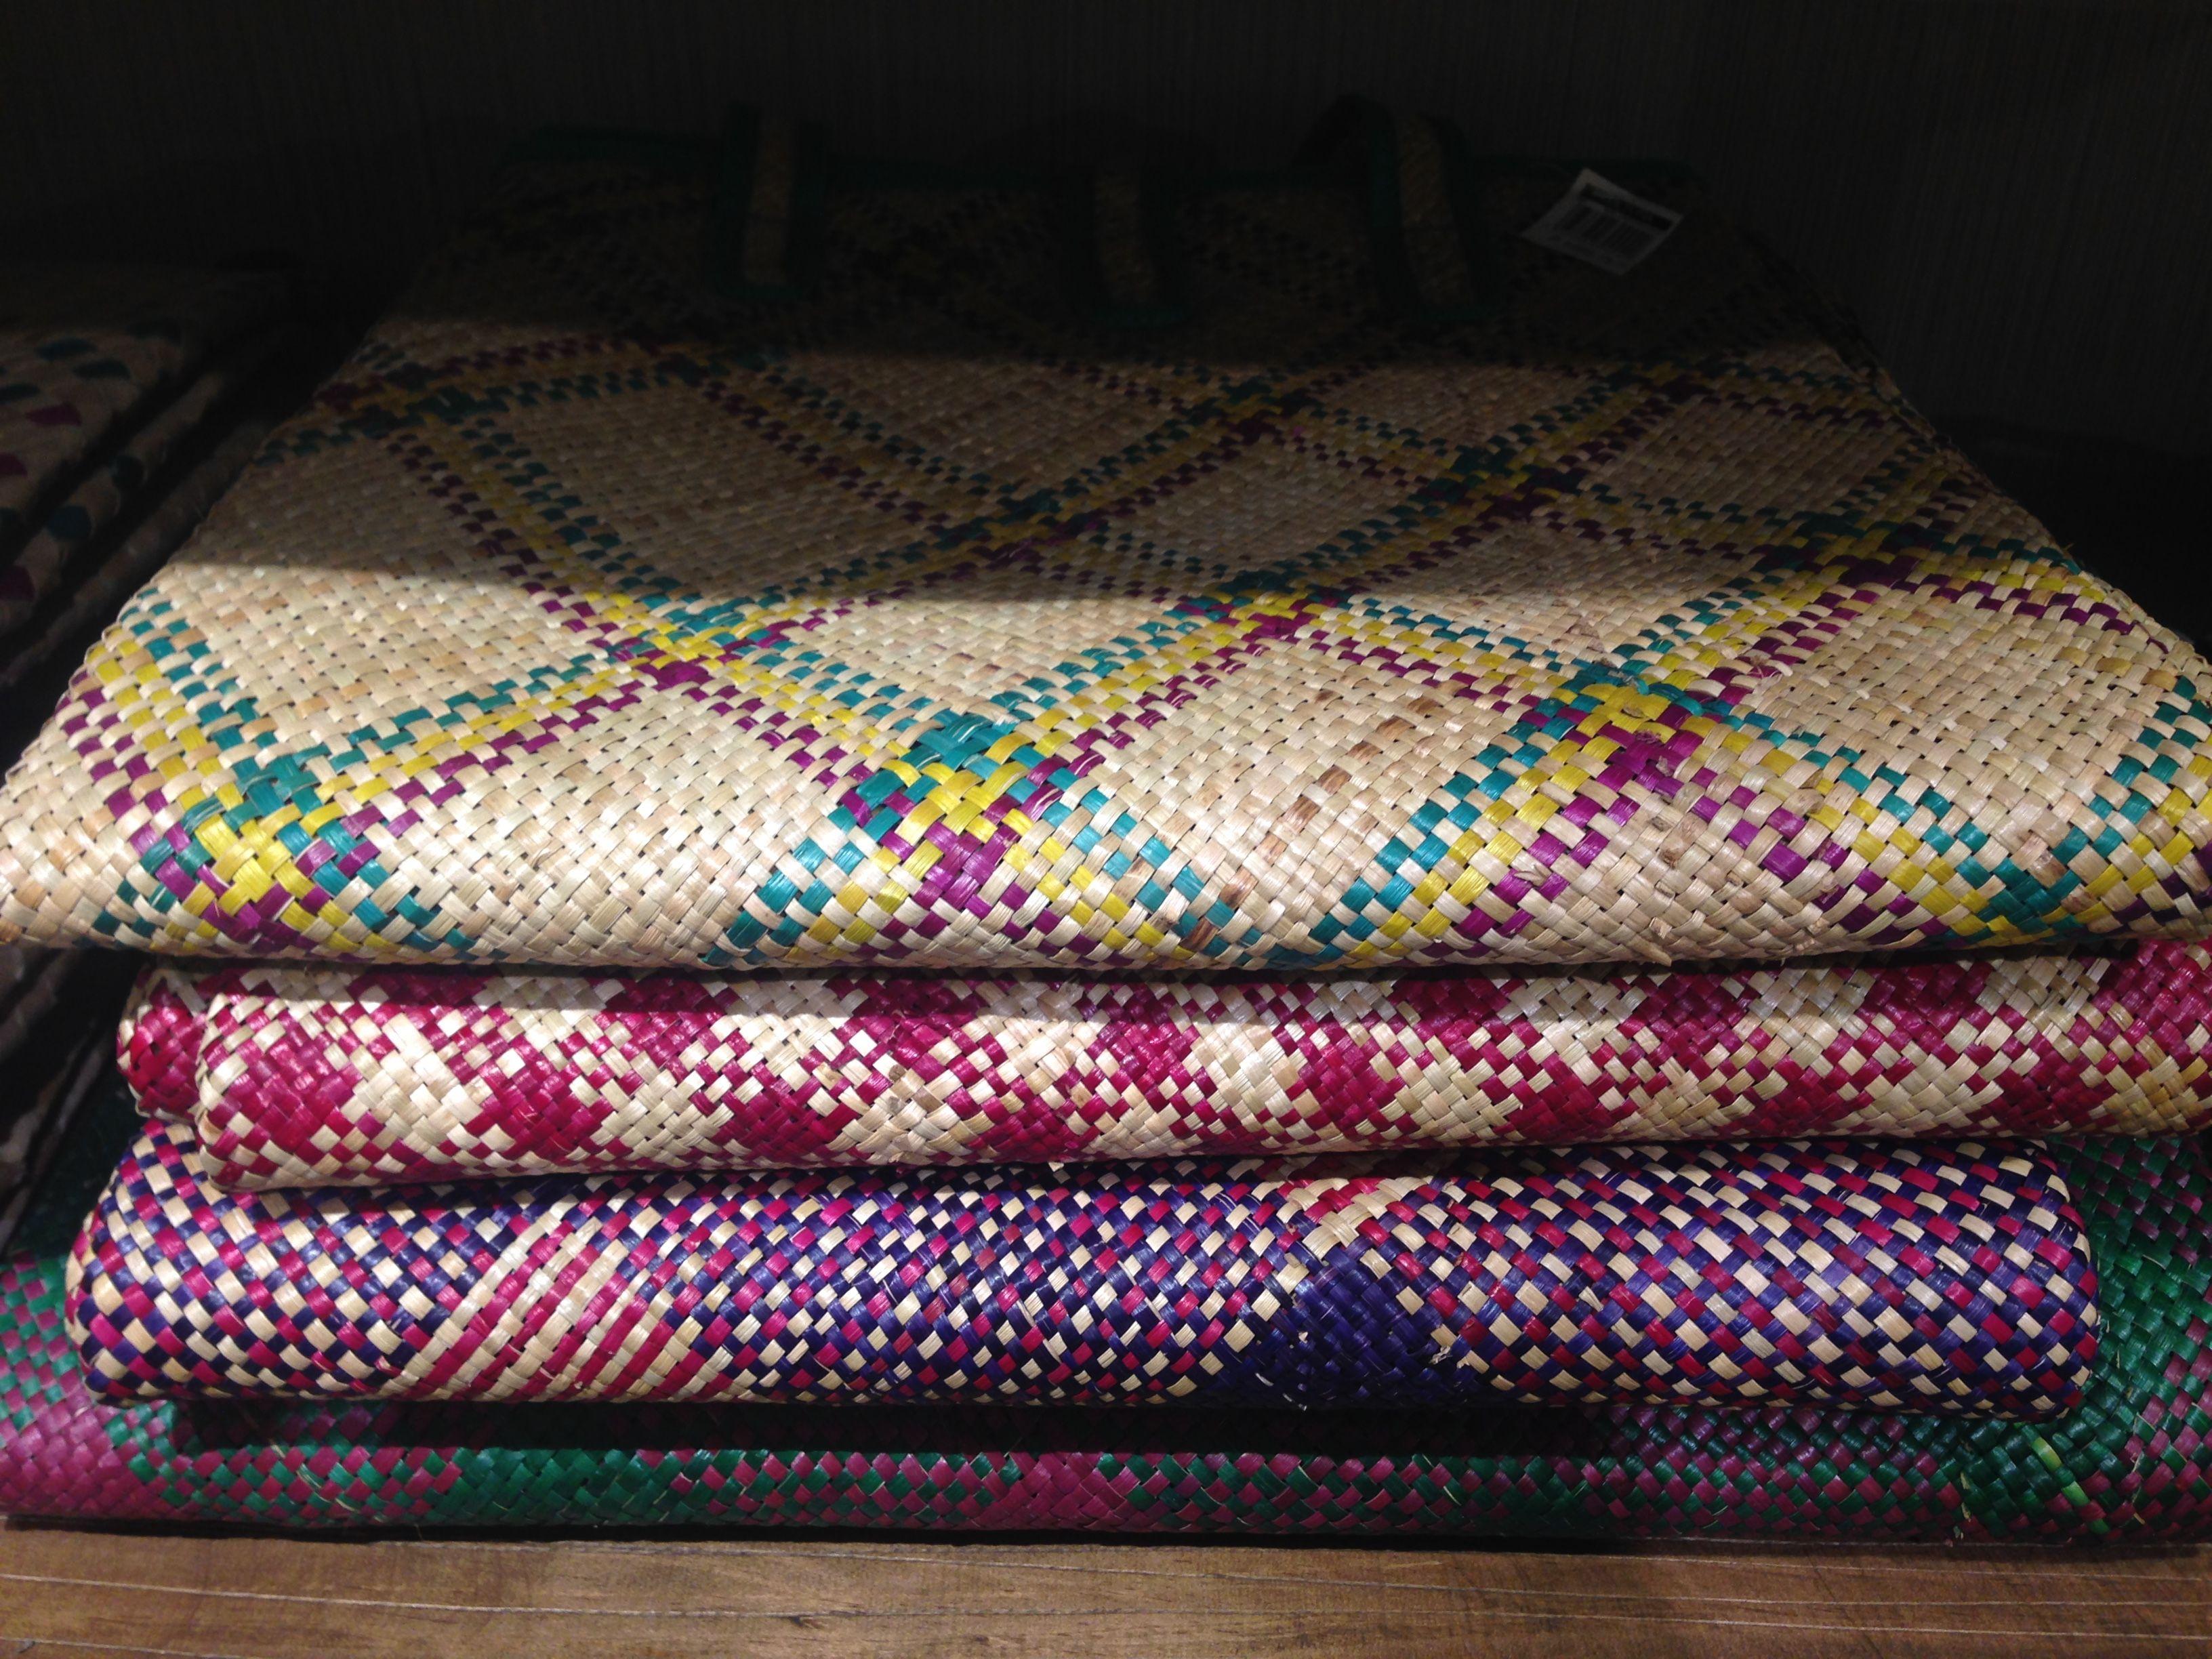 banig made from tikog